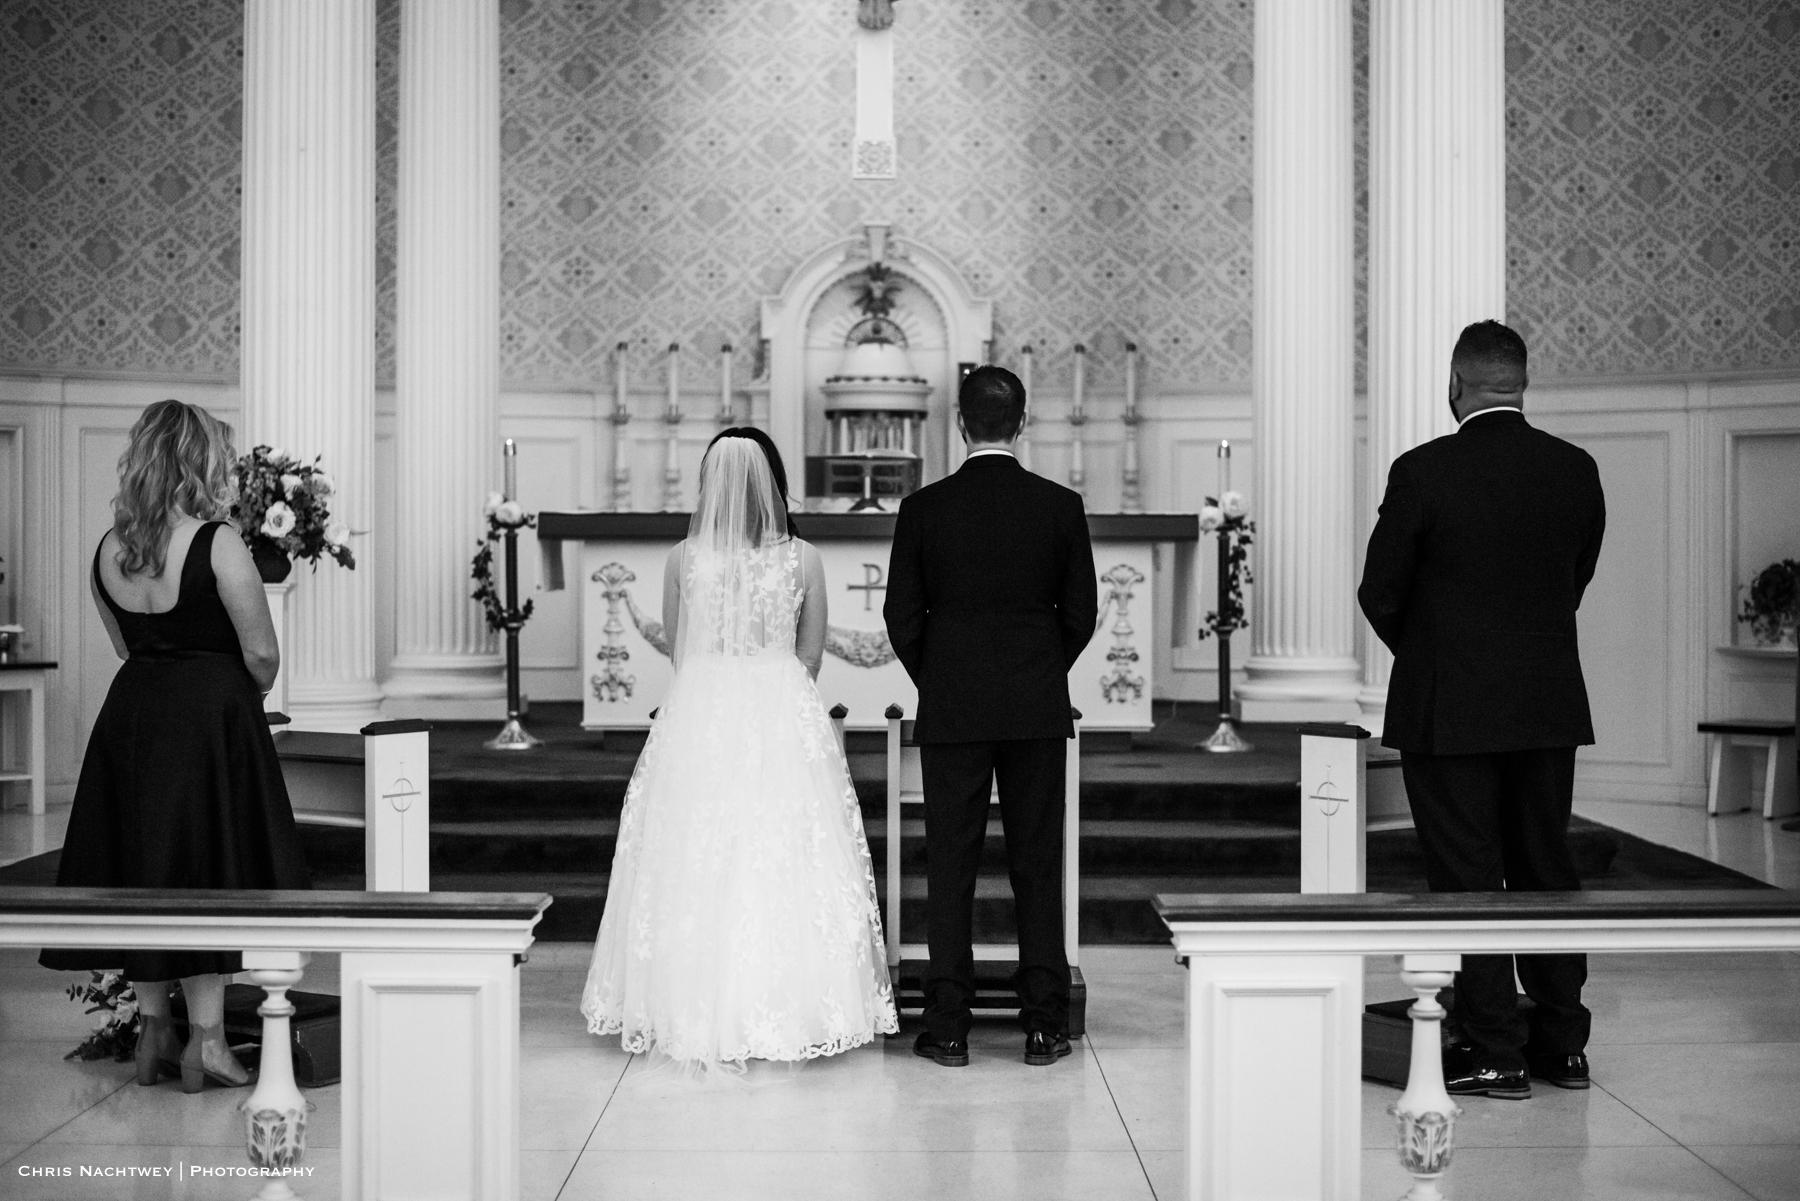 winter-branford-house-wedding-photos-groton-ct-chris-nachtwey-photography-2019-12.jpg